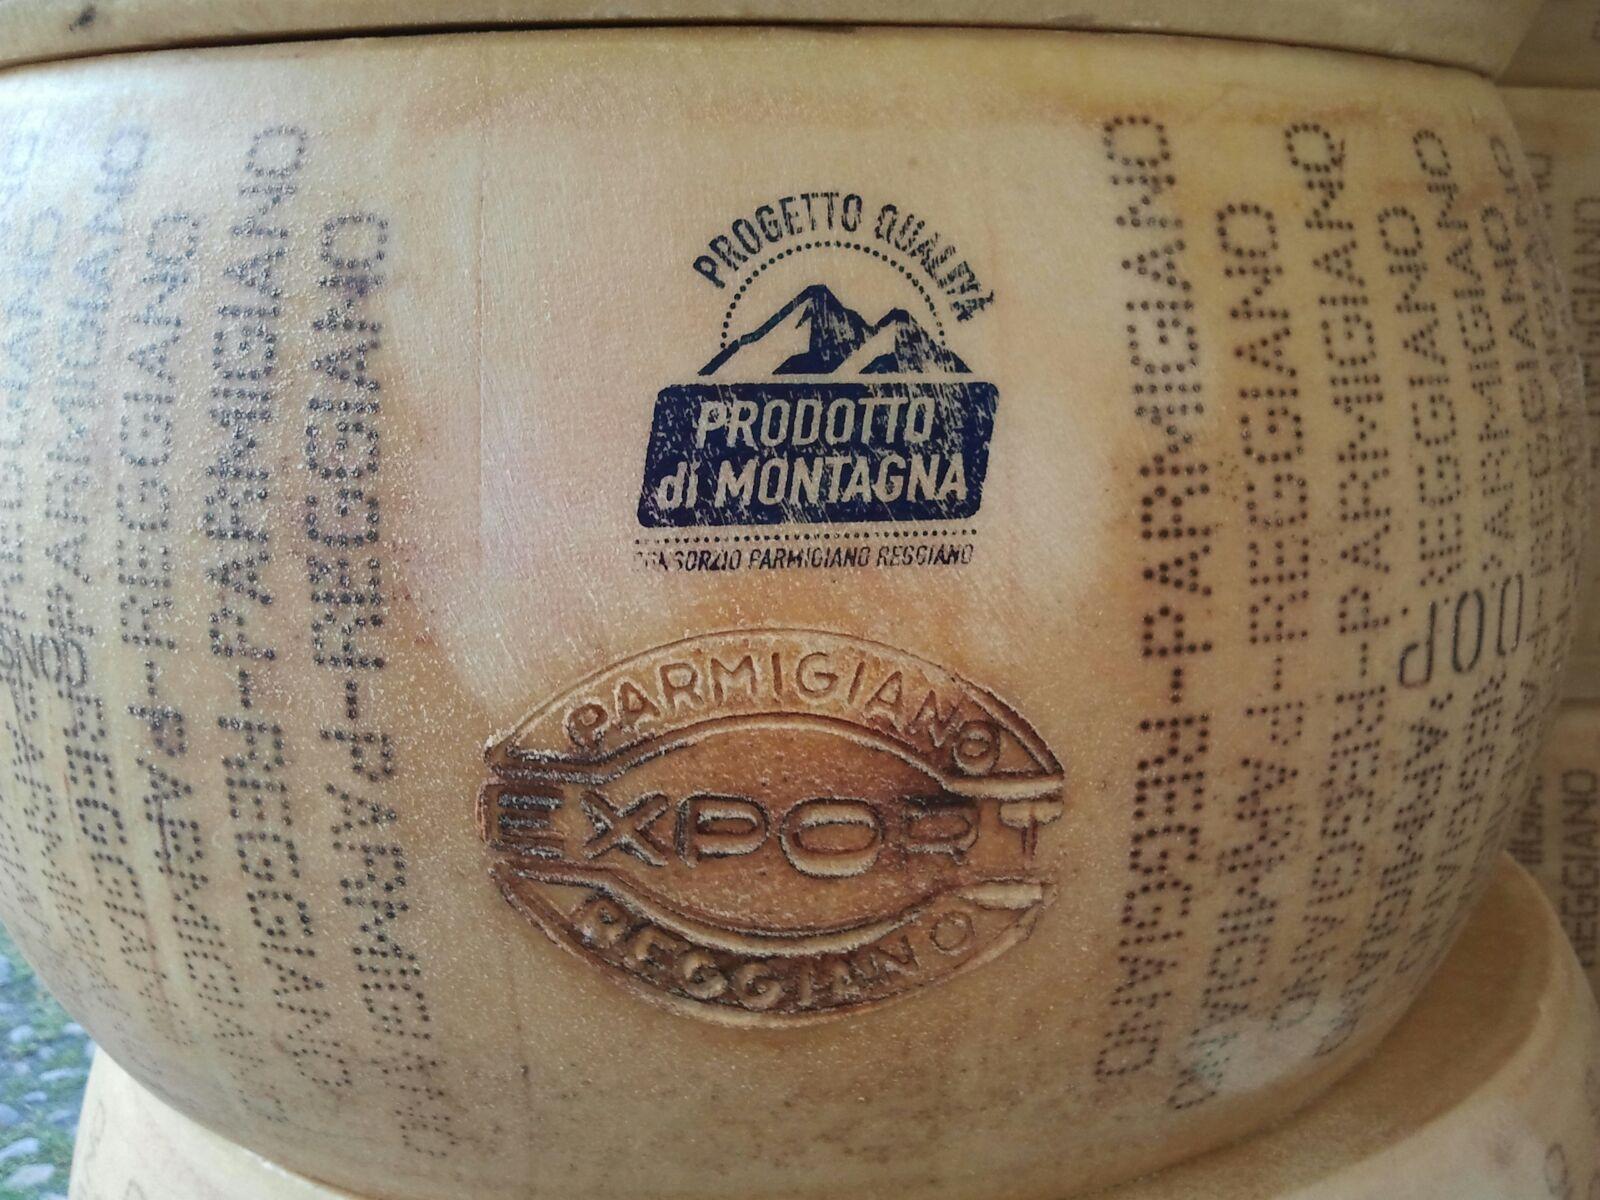 Vendita forme di Parmigiano Reggiano con marchio EXPORT